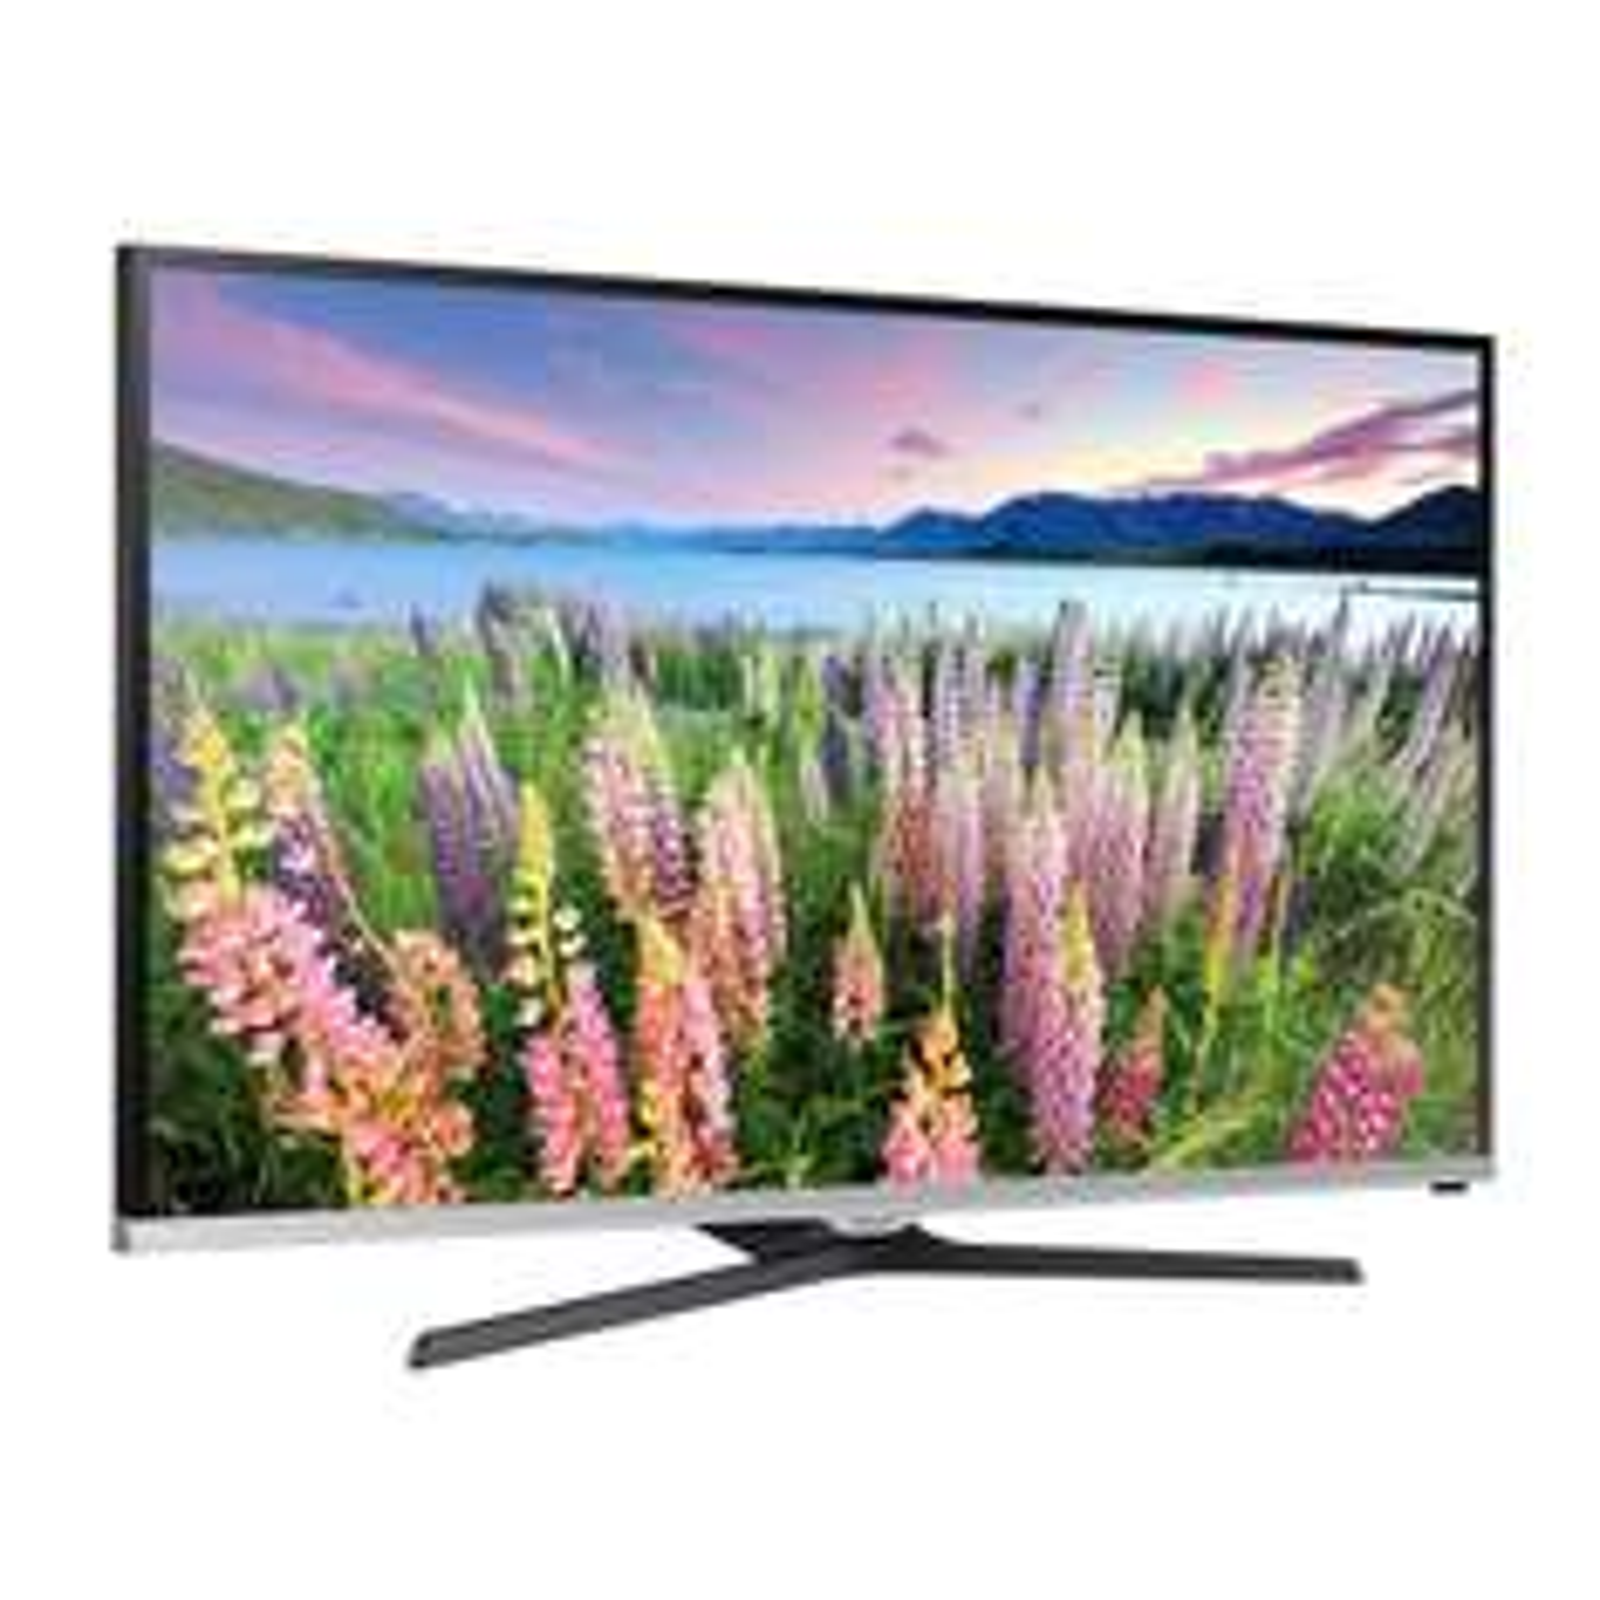 "TV 32"" Samsung UE32J5100 Full HD (Avec ODR de 10%)"